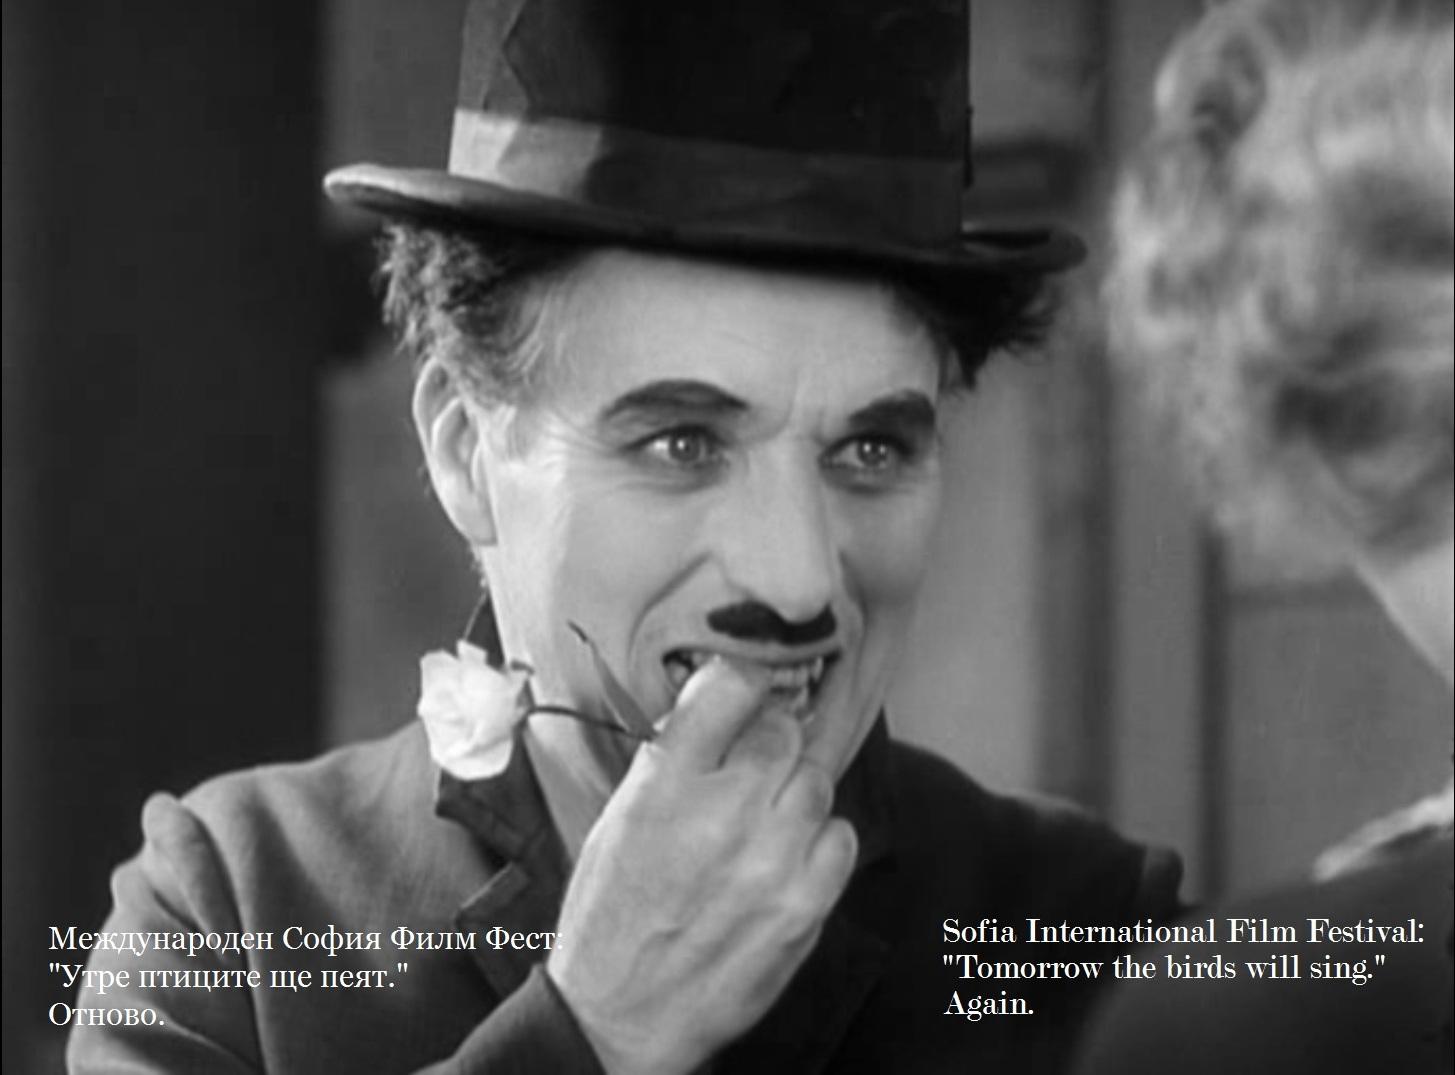 Chaplin_SFF_BG_ENG.jpg